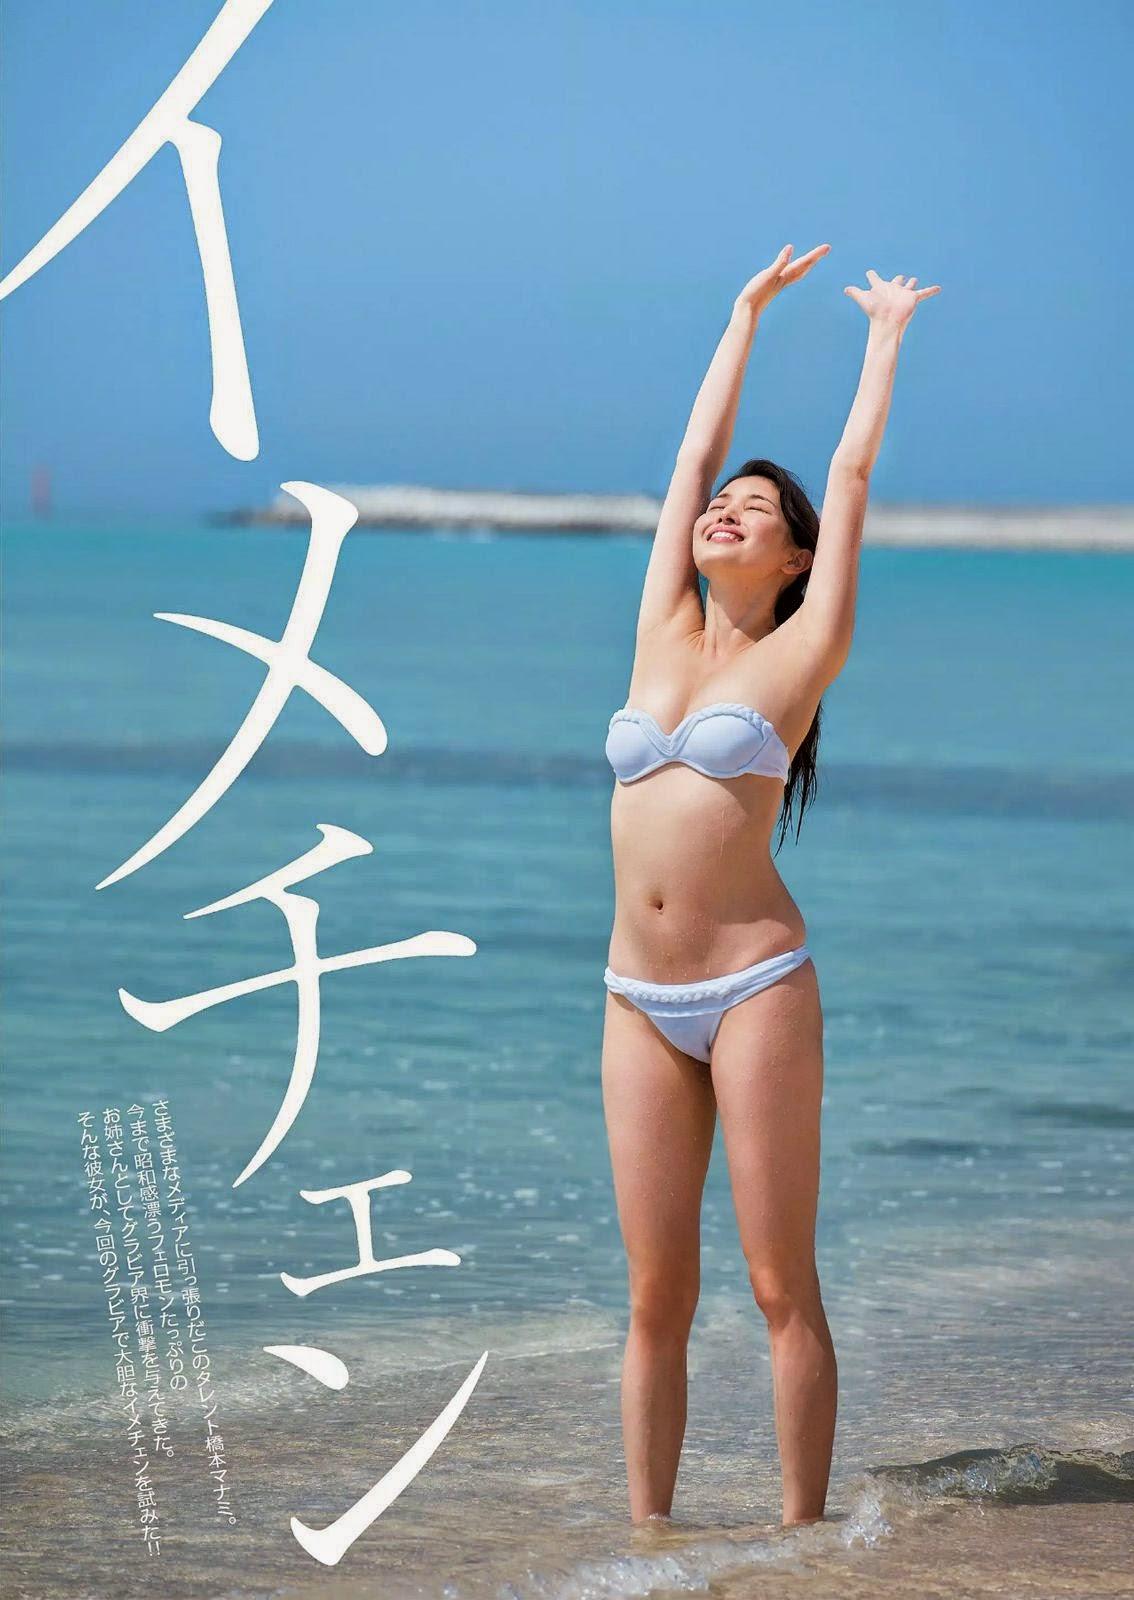 Hashimoto Manami 橋本マナミ Weekly Playboy 週刊プレイボーイ No 18 2015 Images 2